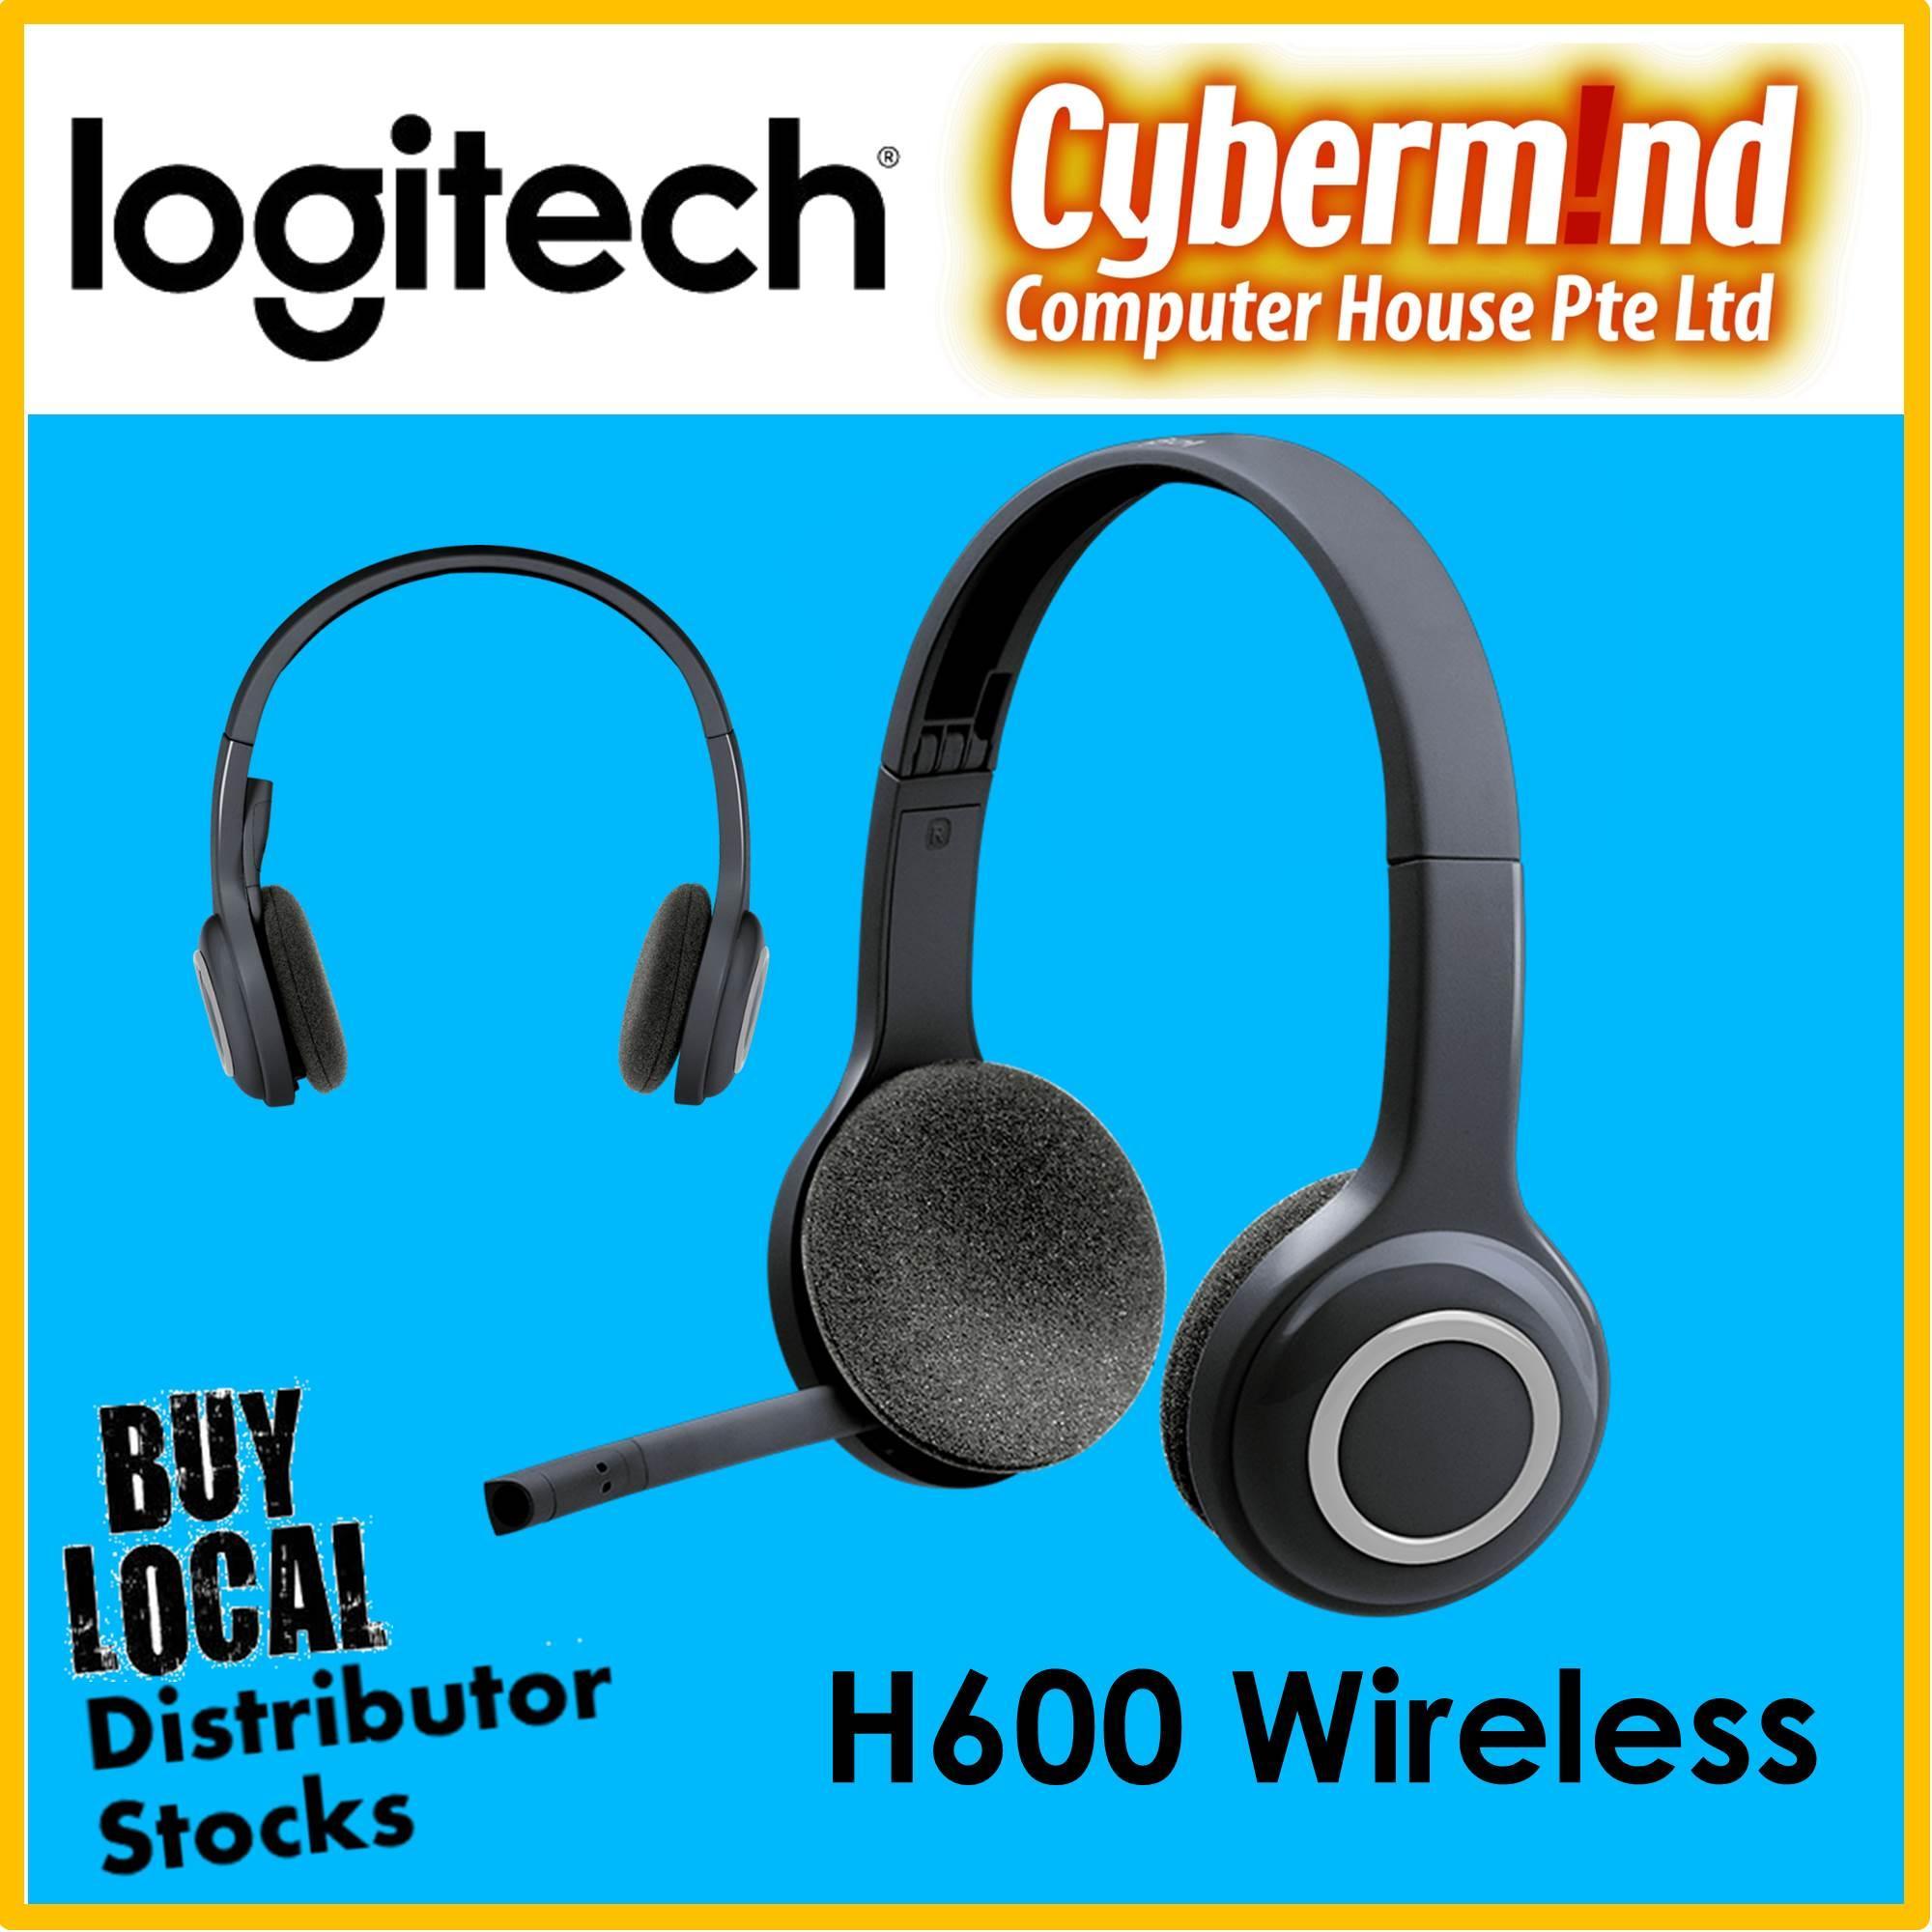 cf3c9e86829 Logitech H600 Wireless Headset for Computer via USB receiver (Local  Distributor Stocks)